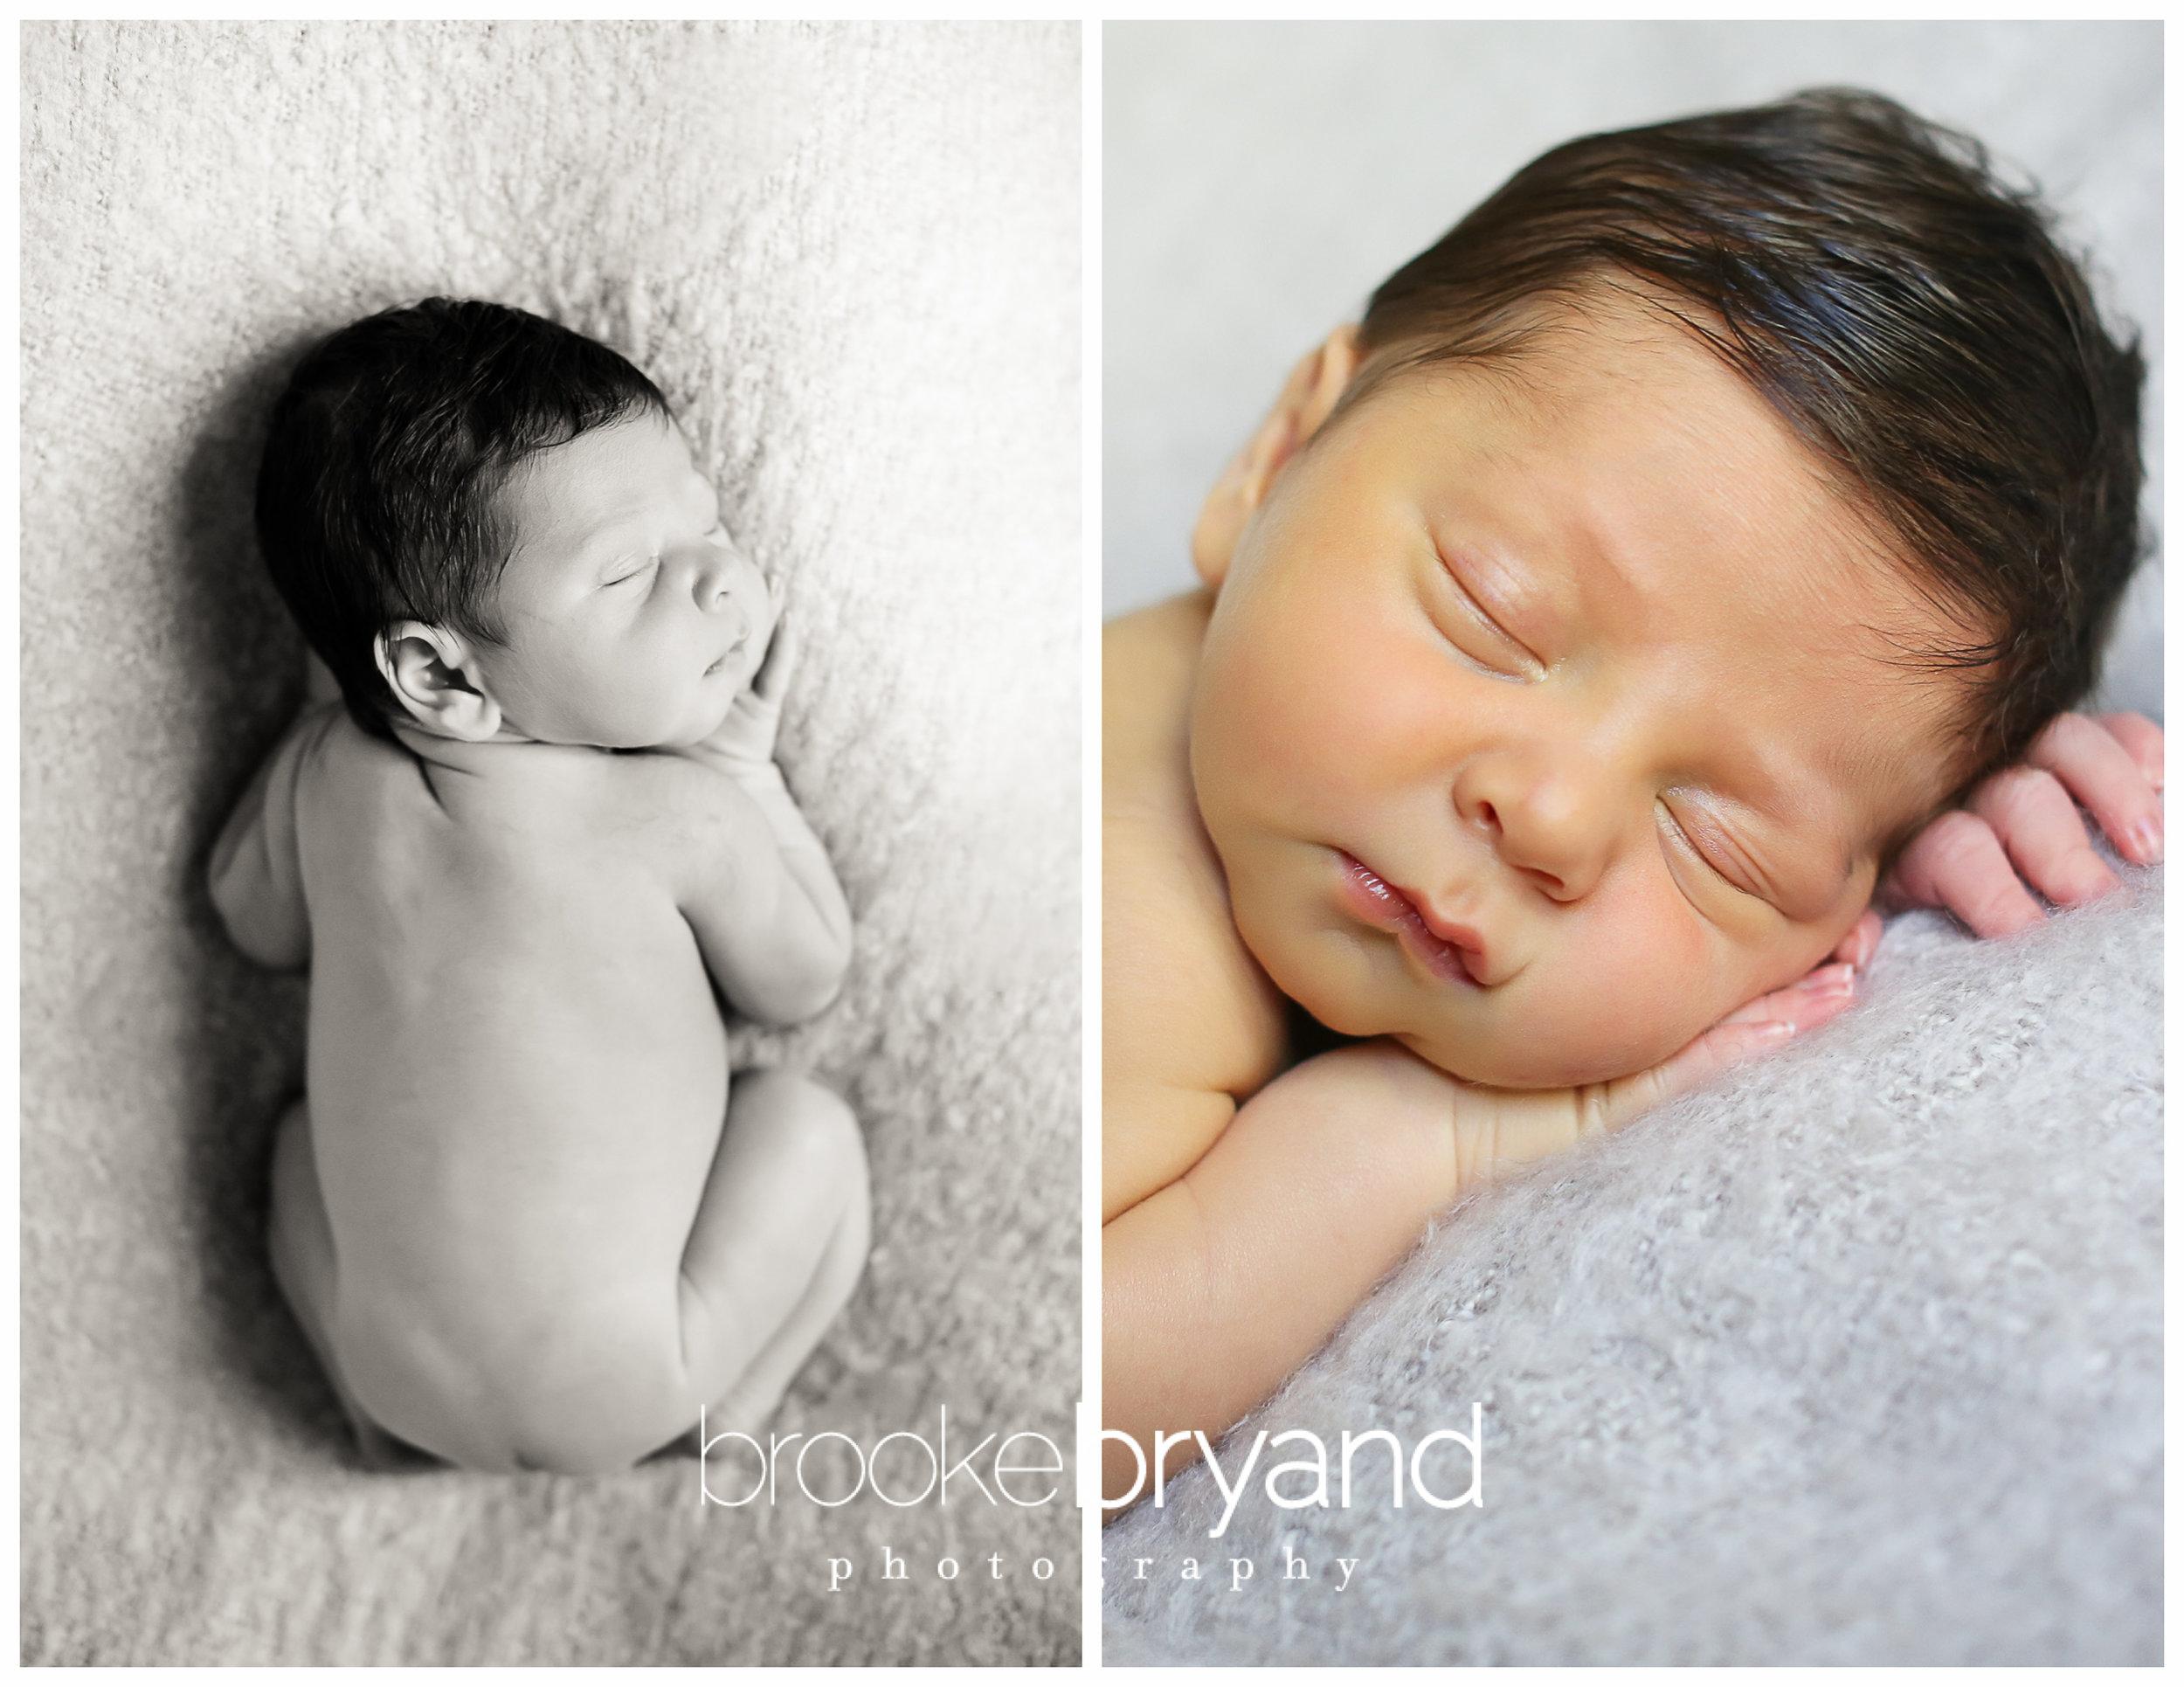 Brooke-Bryand-Photography-San-Francisco-Family-Photographer-Newborn-Photography-2-up-rishwain-2.jpg